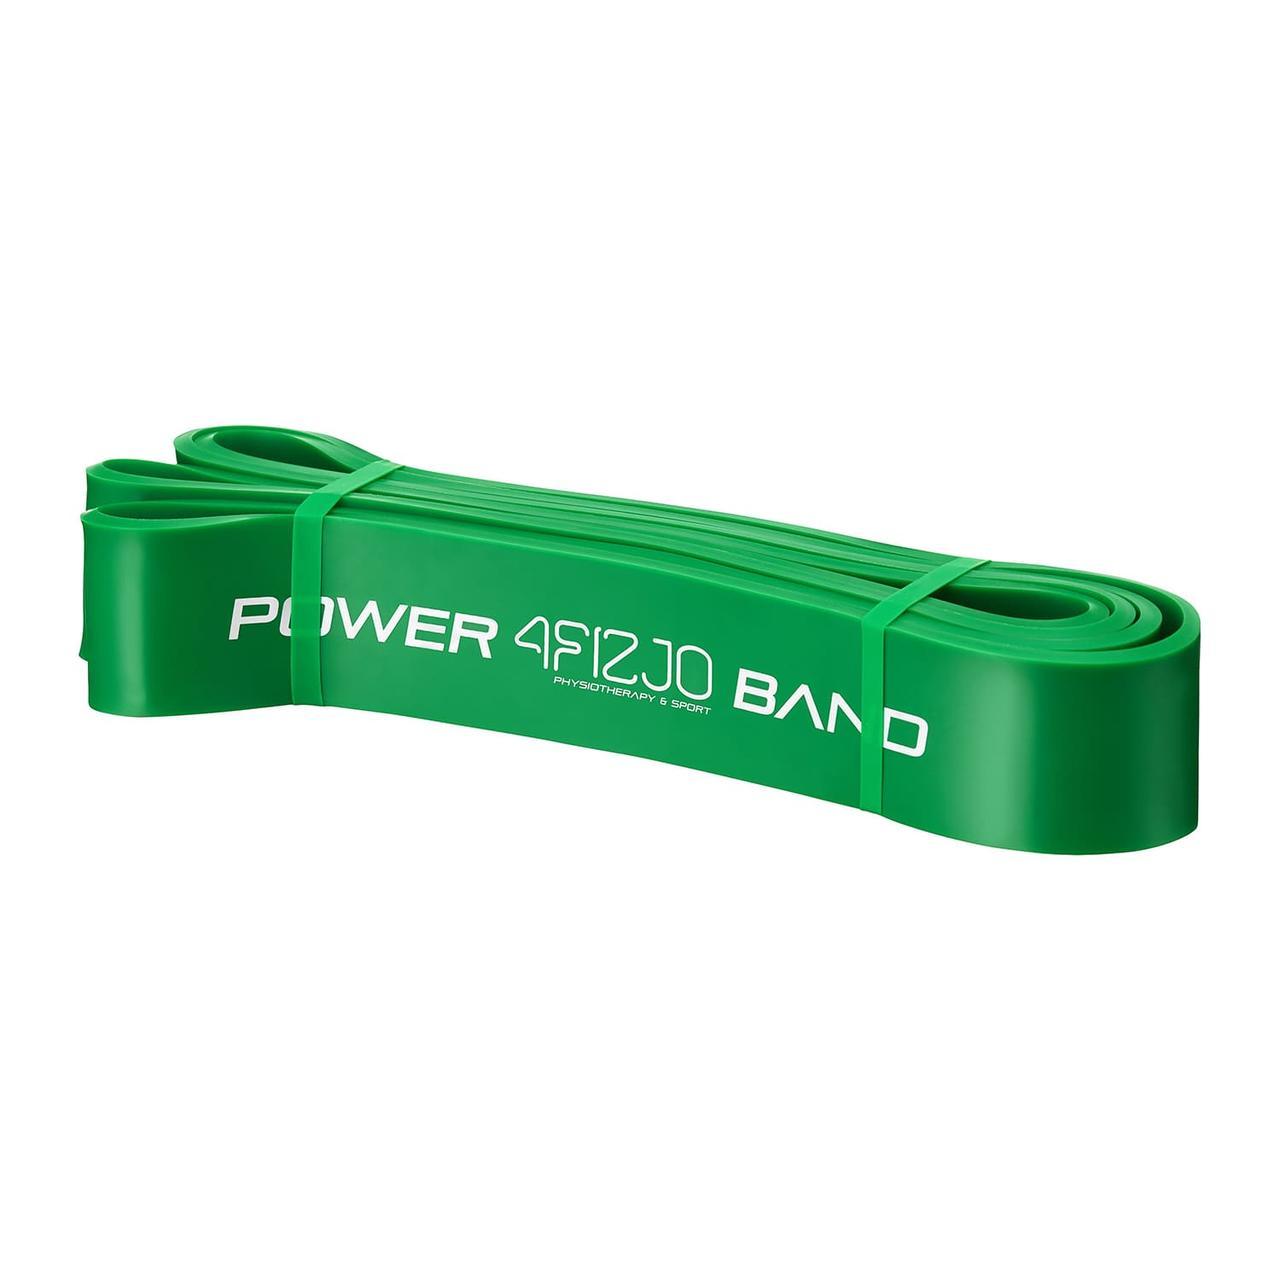 Эспандер-петля (резинка для фитнеса и спорта) 4FIZJO Power Band 45 мм 26-36 кг 4FJ1080